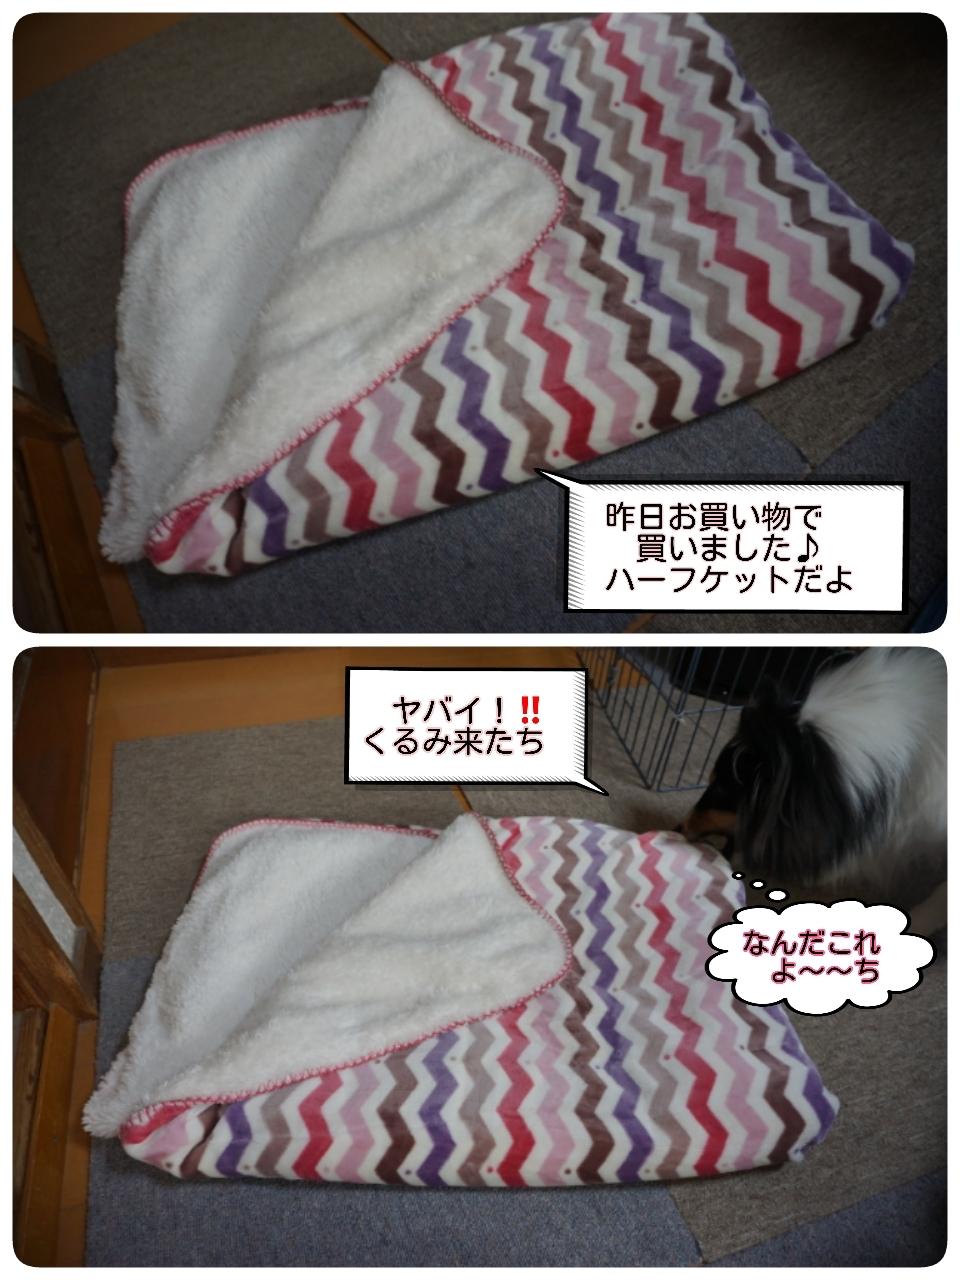 16-11-10-14-36-27-770_deco.jpg